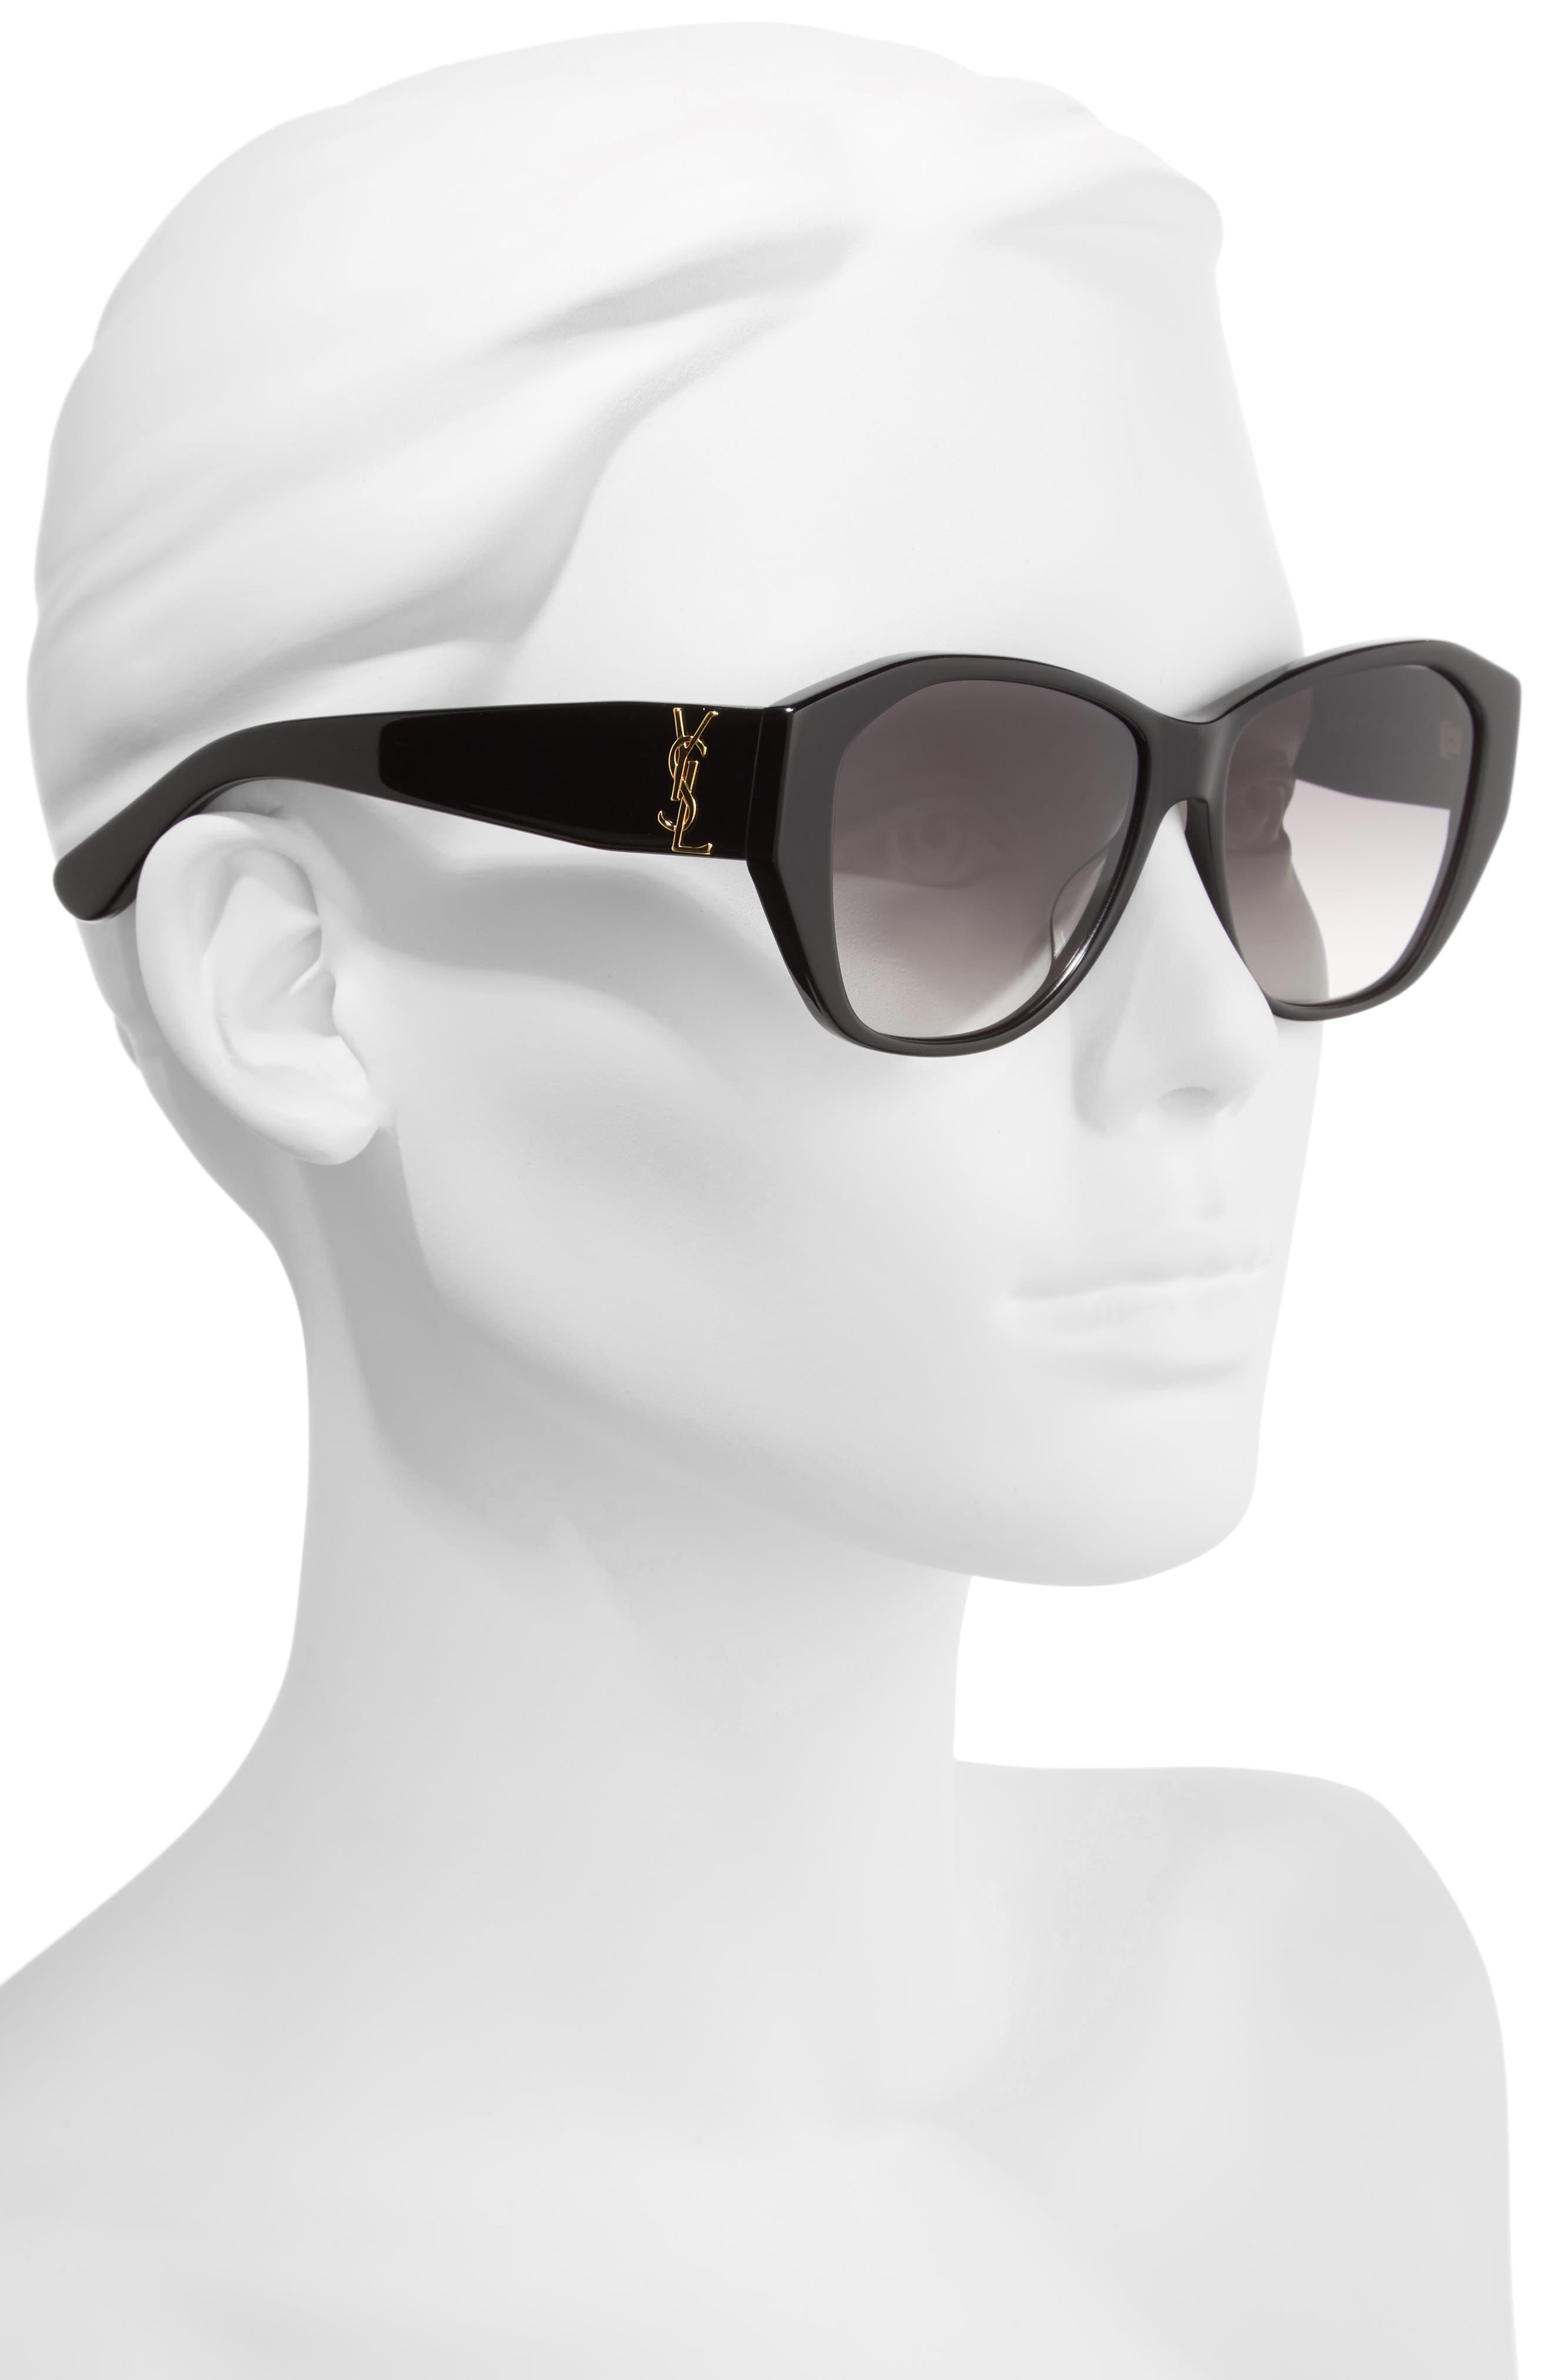 56mm Sunglasses,                             Alternate thumbnail 2, color,                             Black/ Black/ Grey